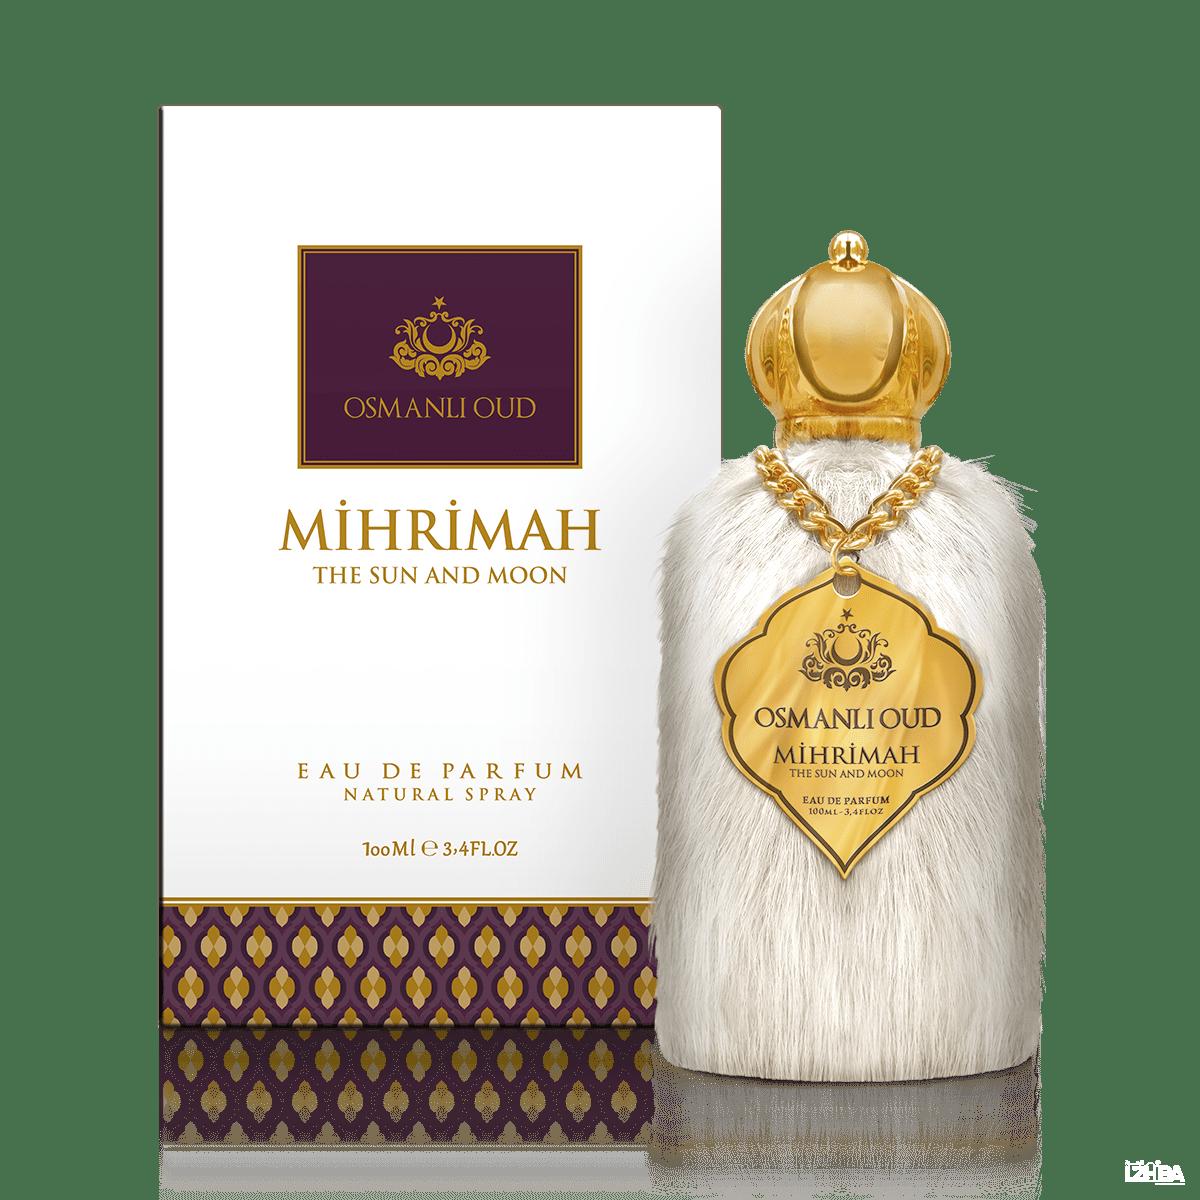 Mihrimah the sun and moon EDP Perfume 100 ML